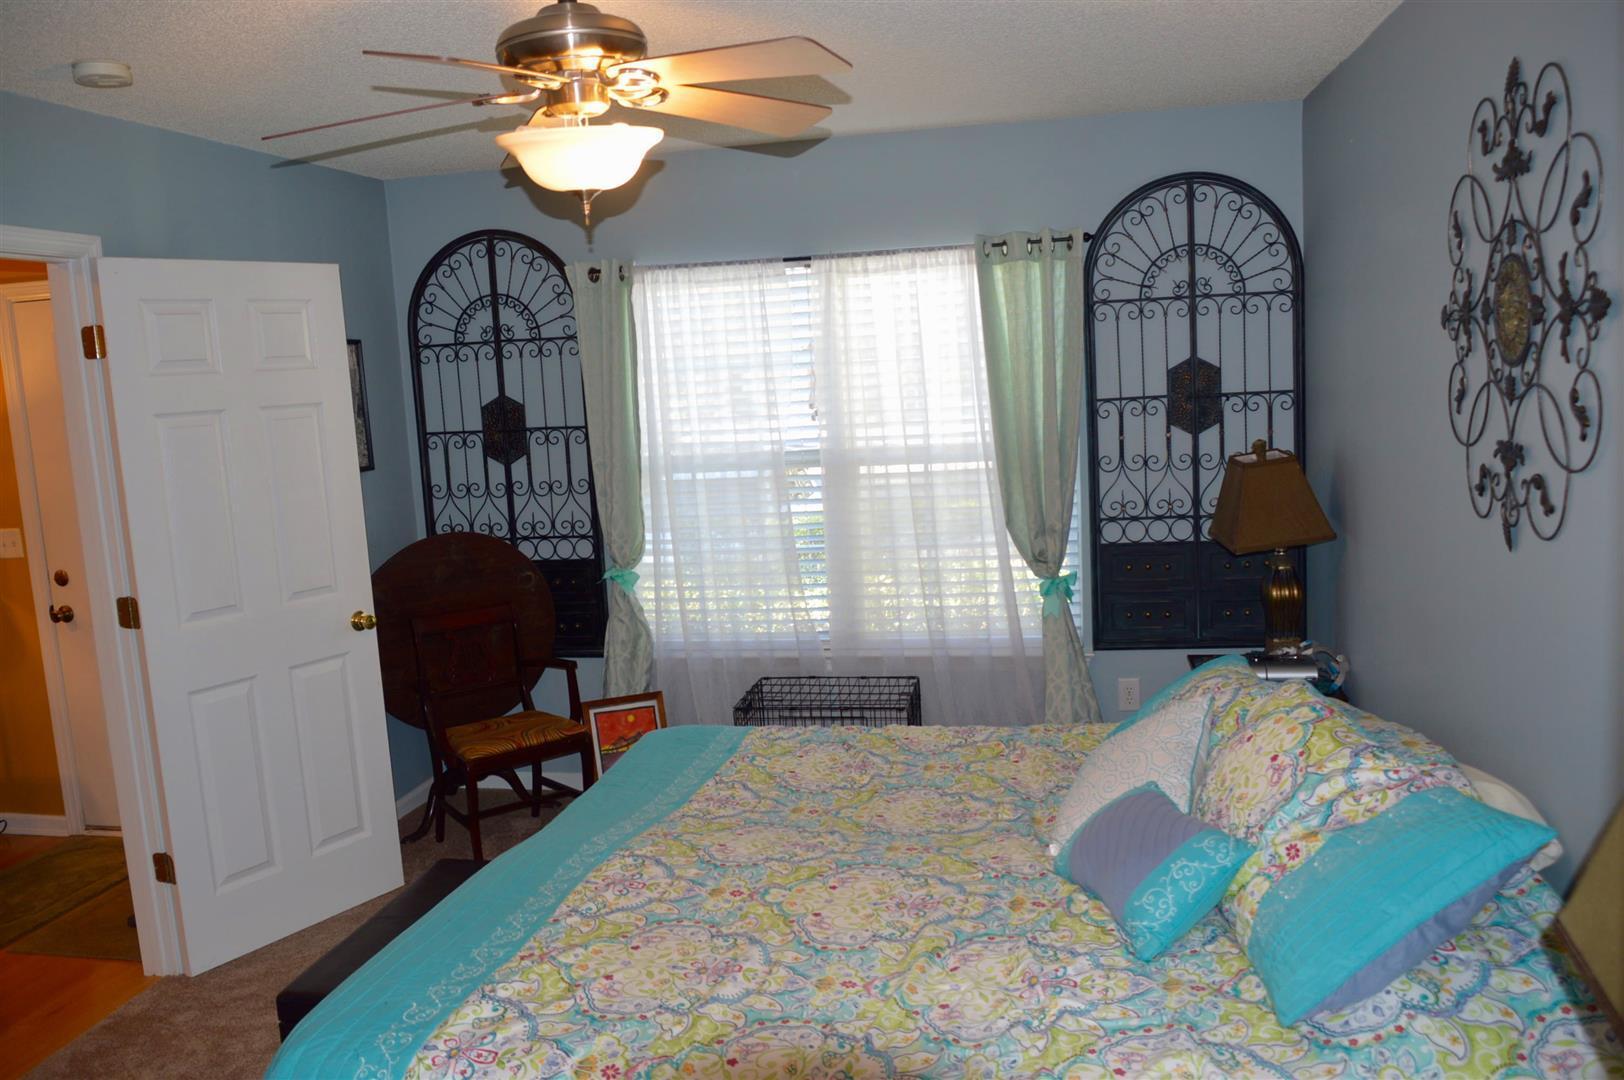 Oak Bluff Homes For Sale - 8008 Shadow Oak, North Charleston, SC - 15